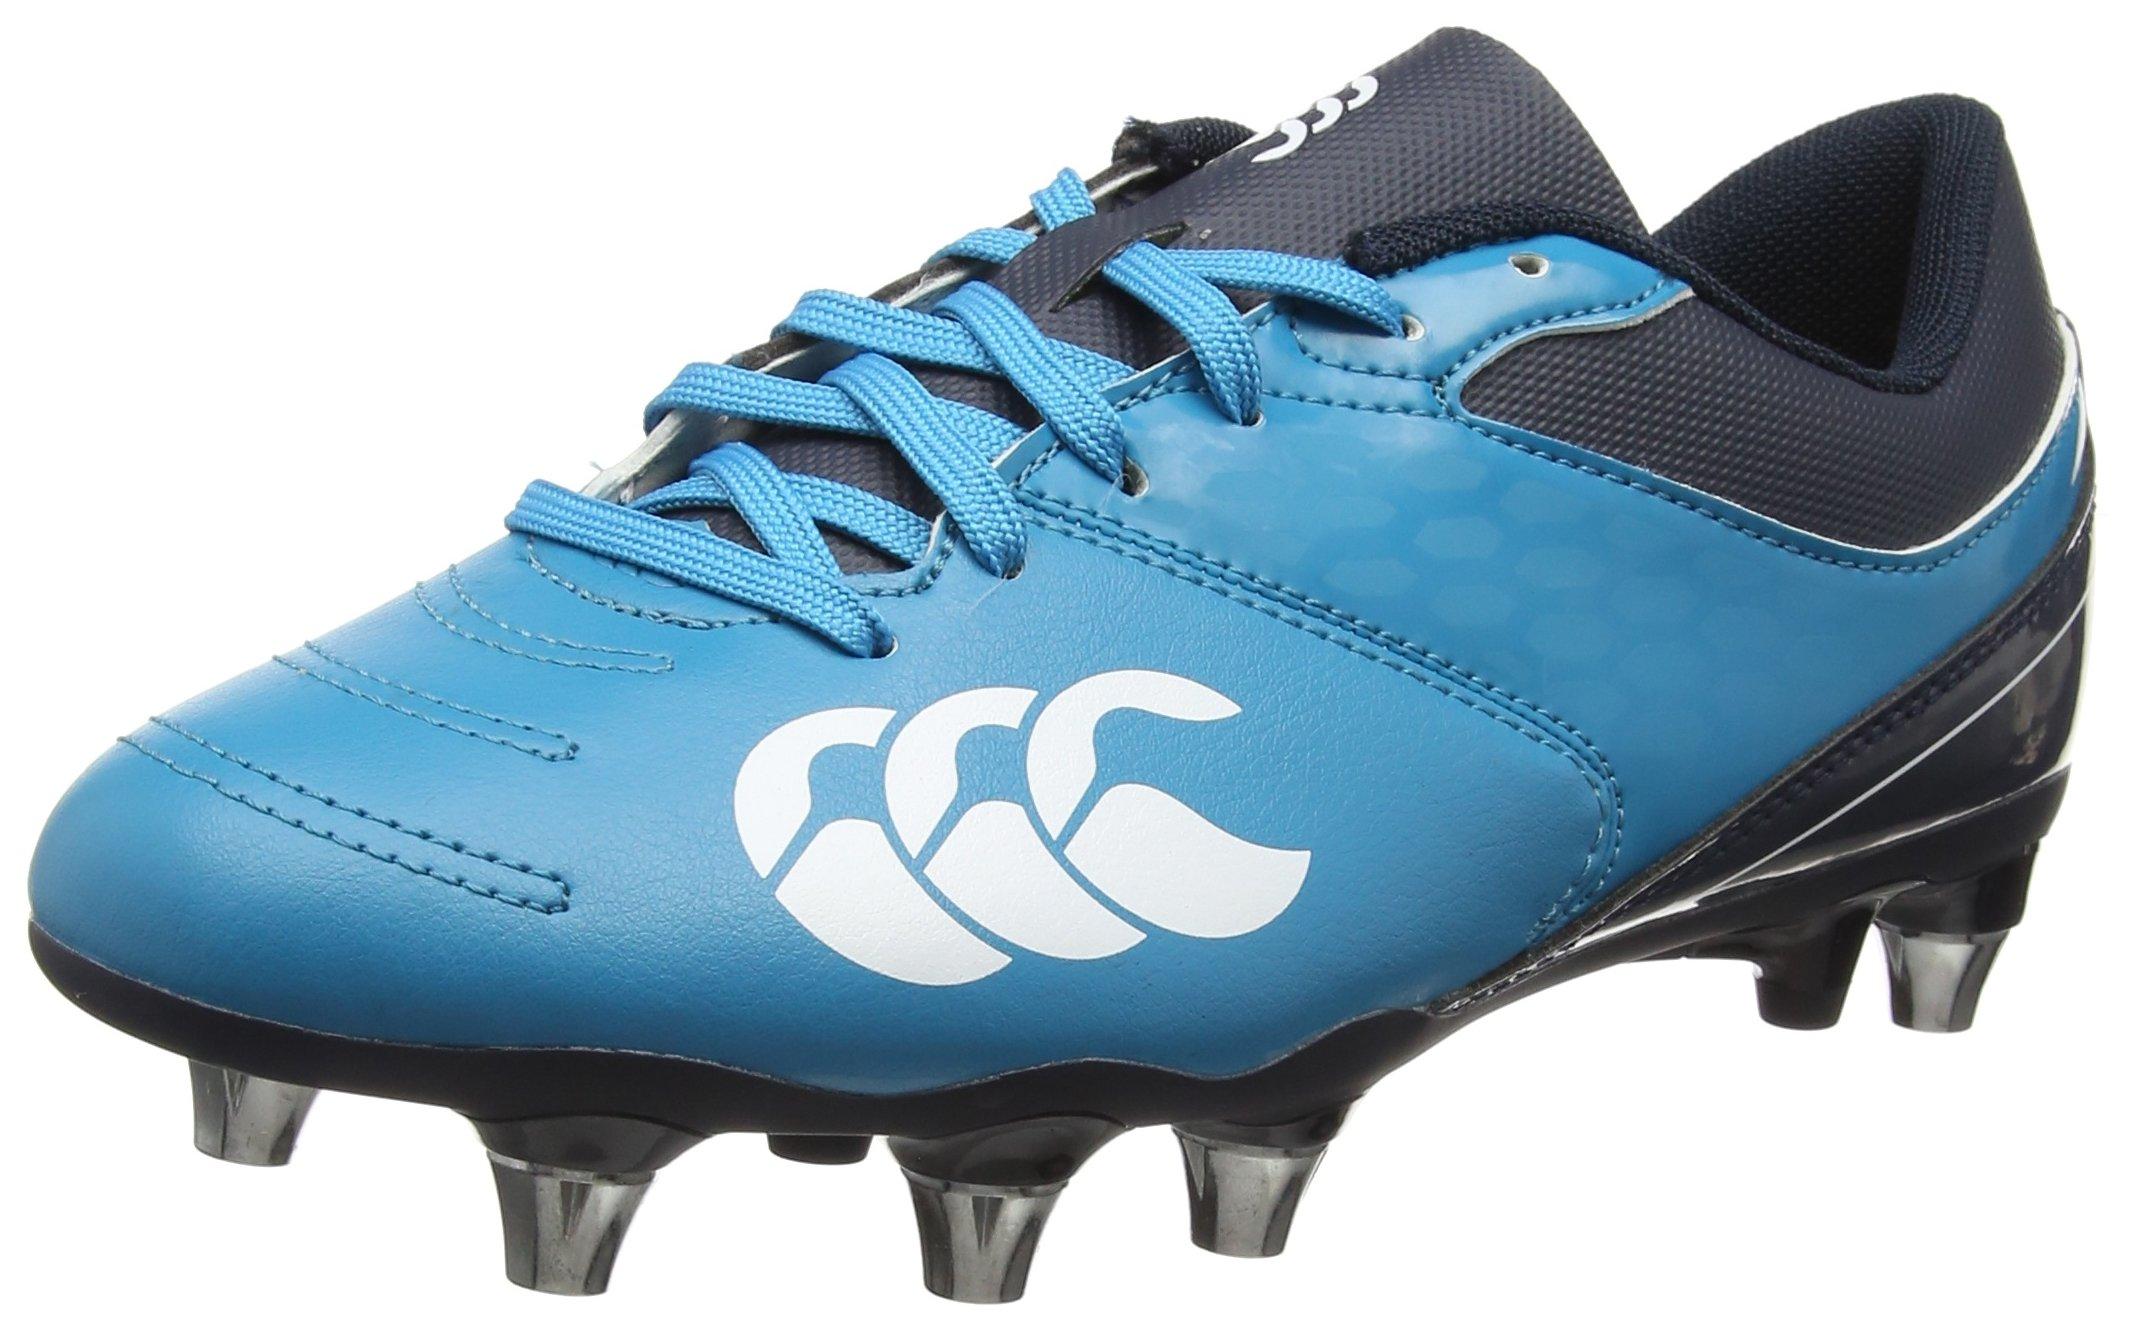 5 Soft Sea42 Eu 2 HommeTurquoisecarribean 0 De Rugby Phoenix Canterbury GroundChaussures TlF3JK1c